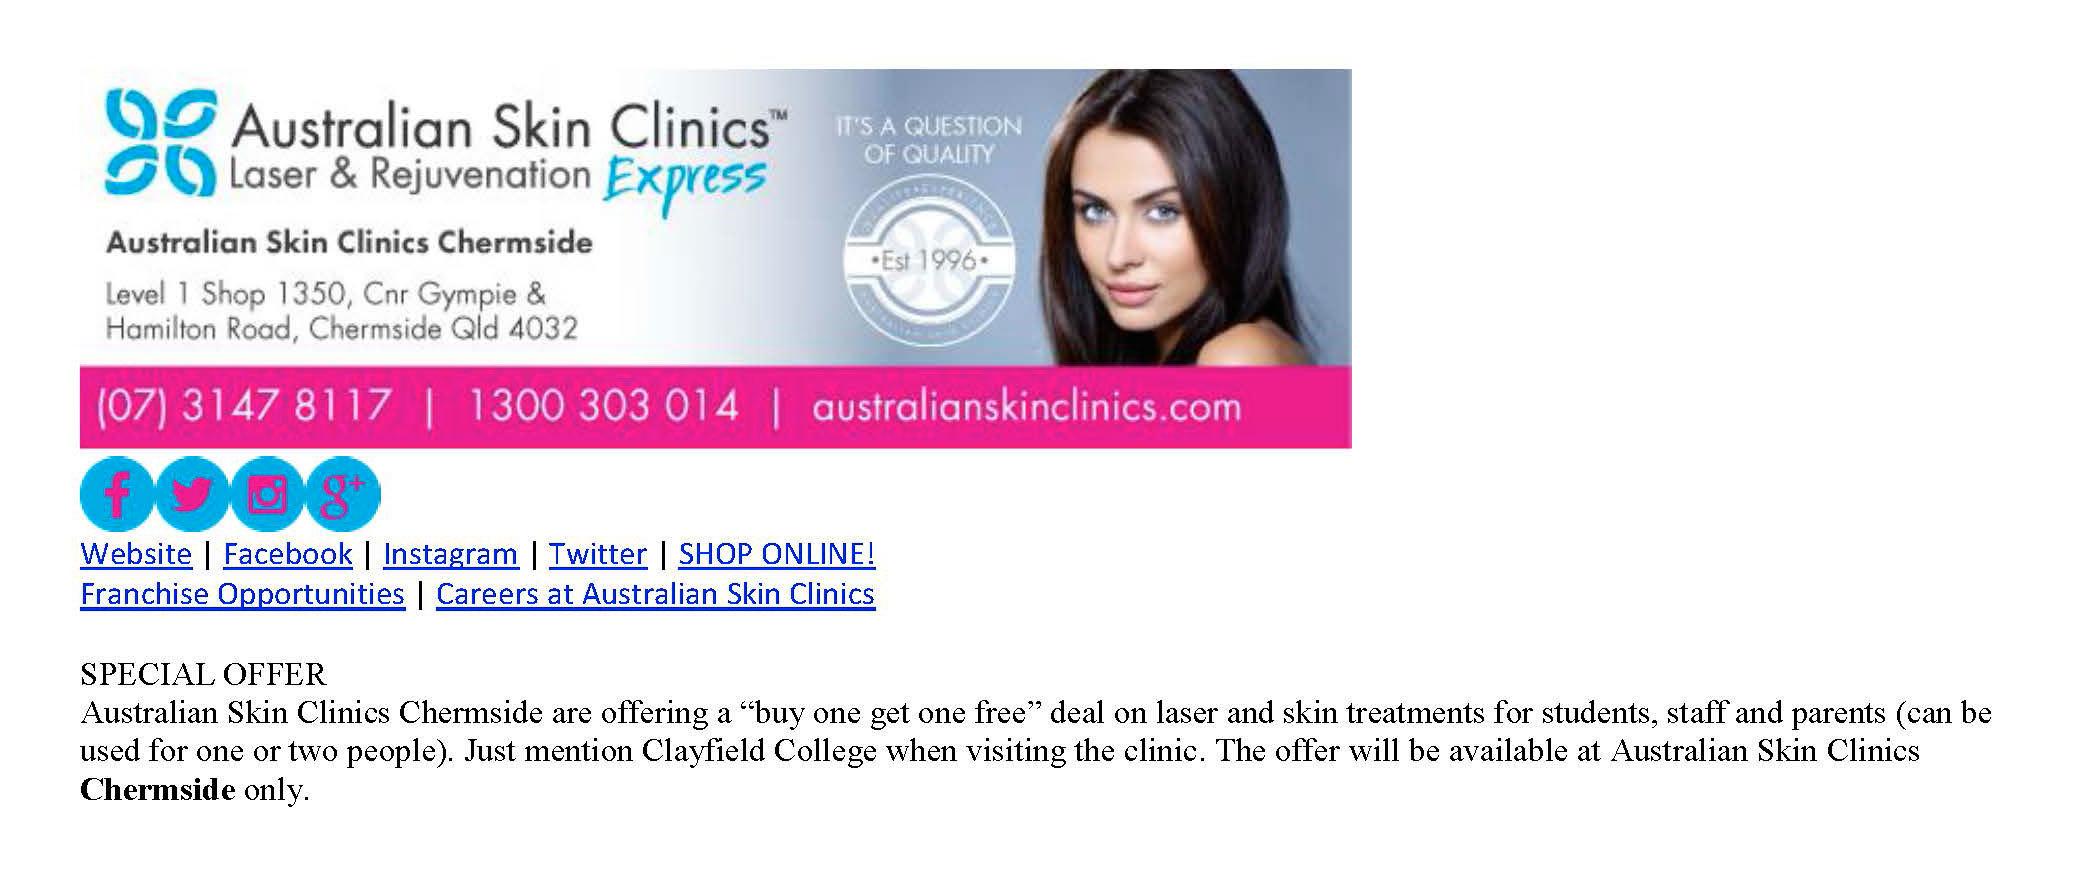 ... Newsletterbanners2 Community Australian Skin Clinics ...